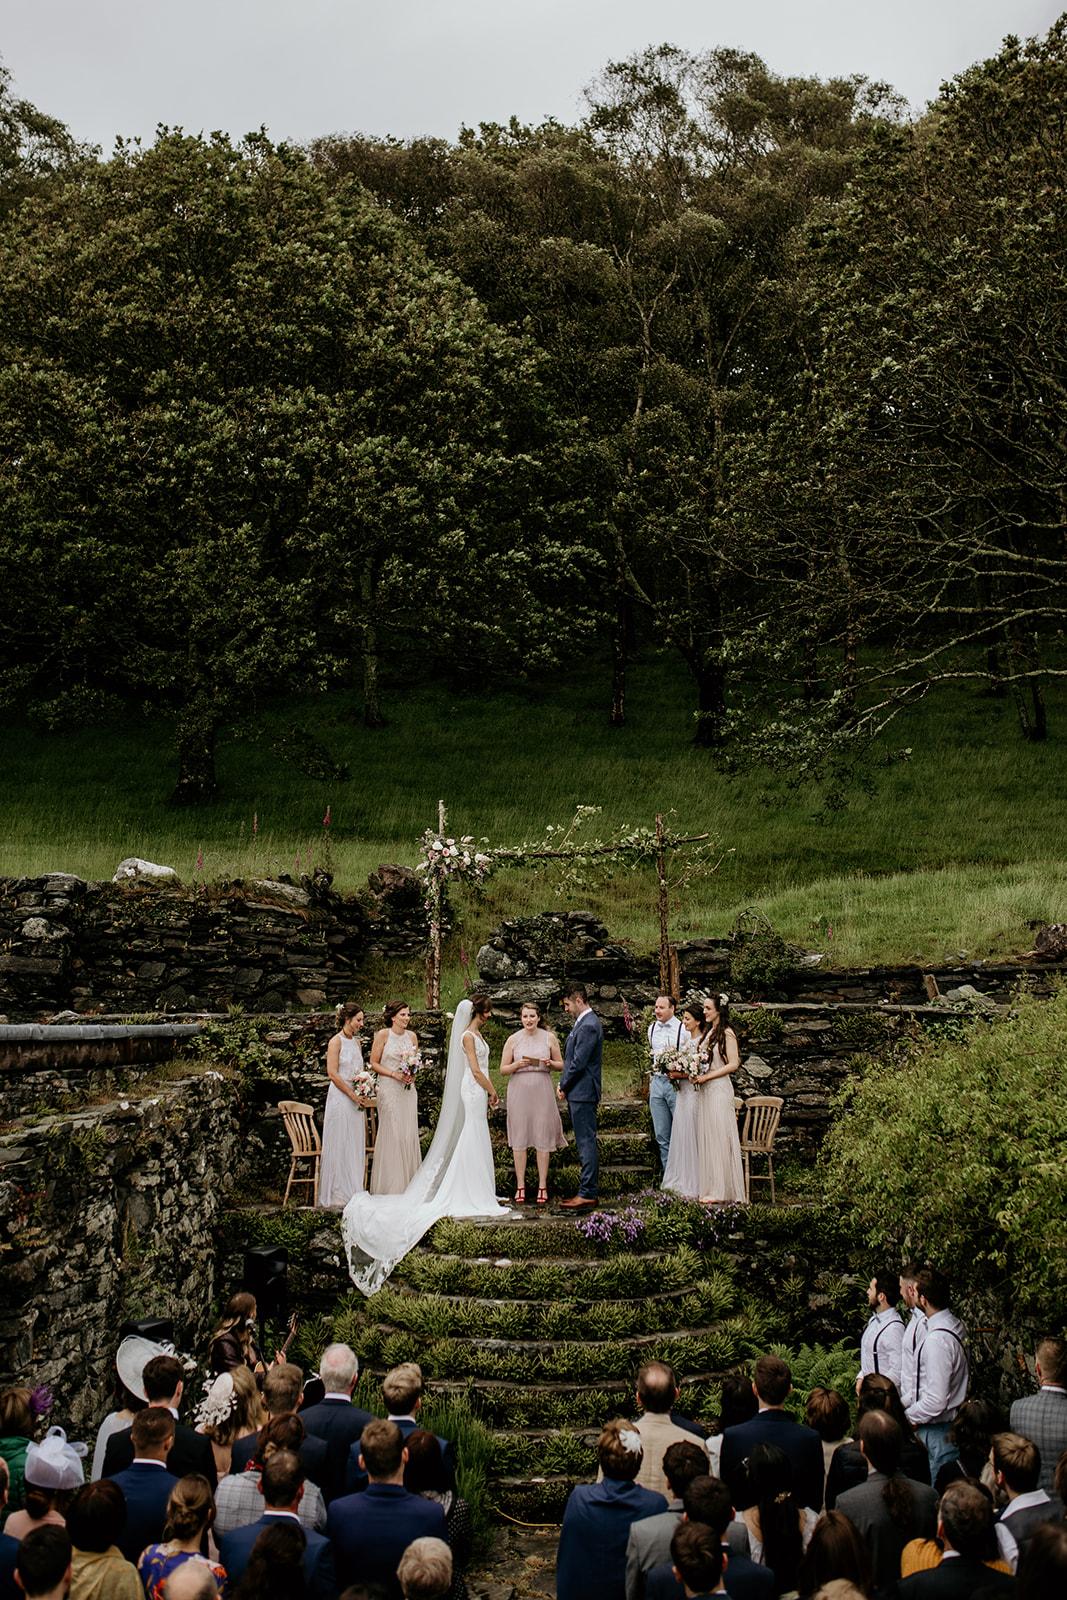 Outdoor humanist ceremony wedding photographer Wales